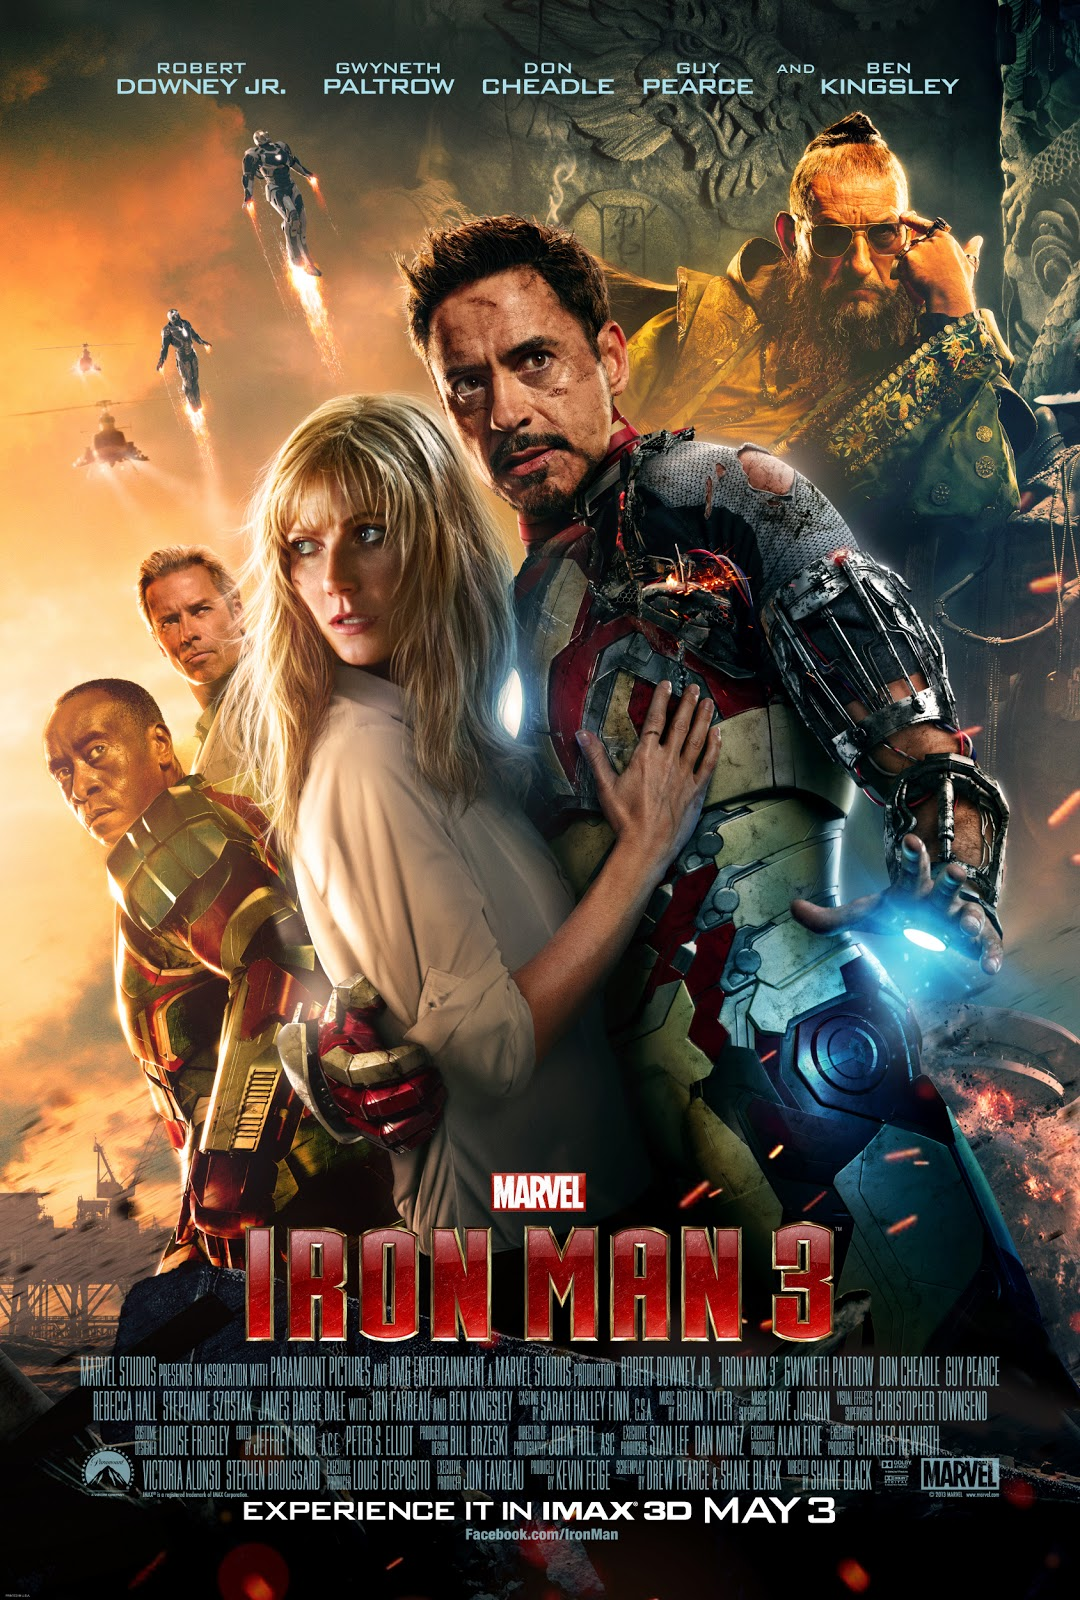 ... film box office terlaris untuk minggu pertama bulan mei film yang